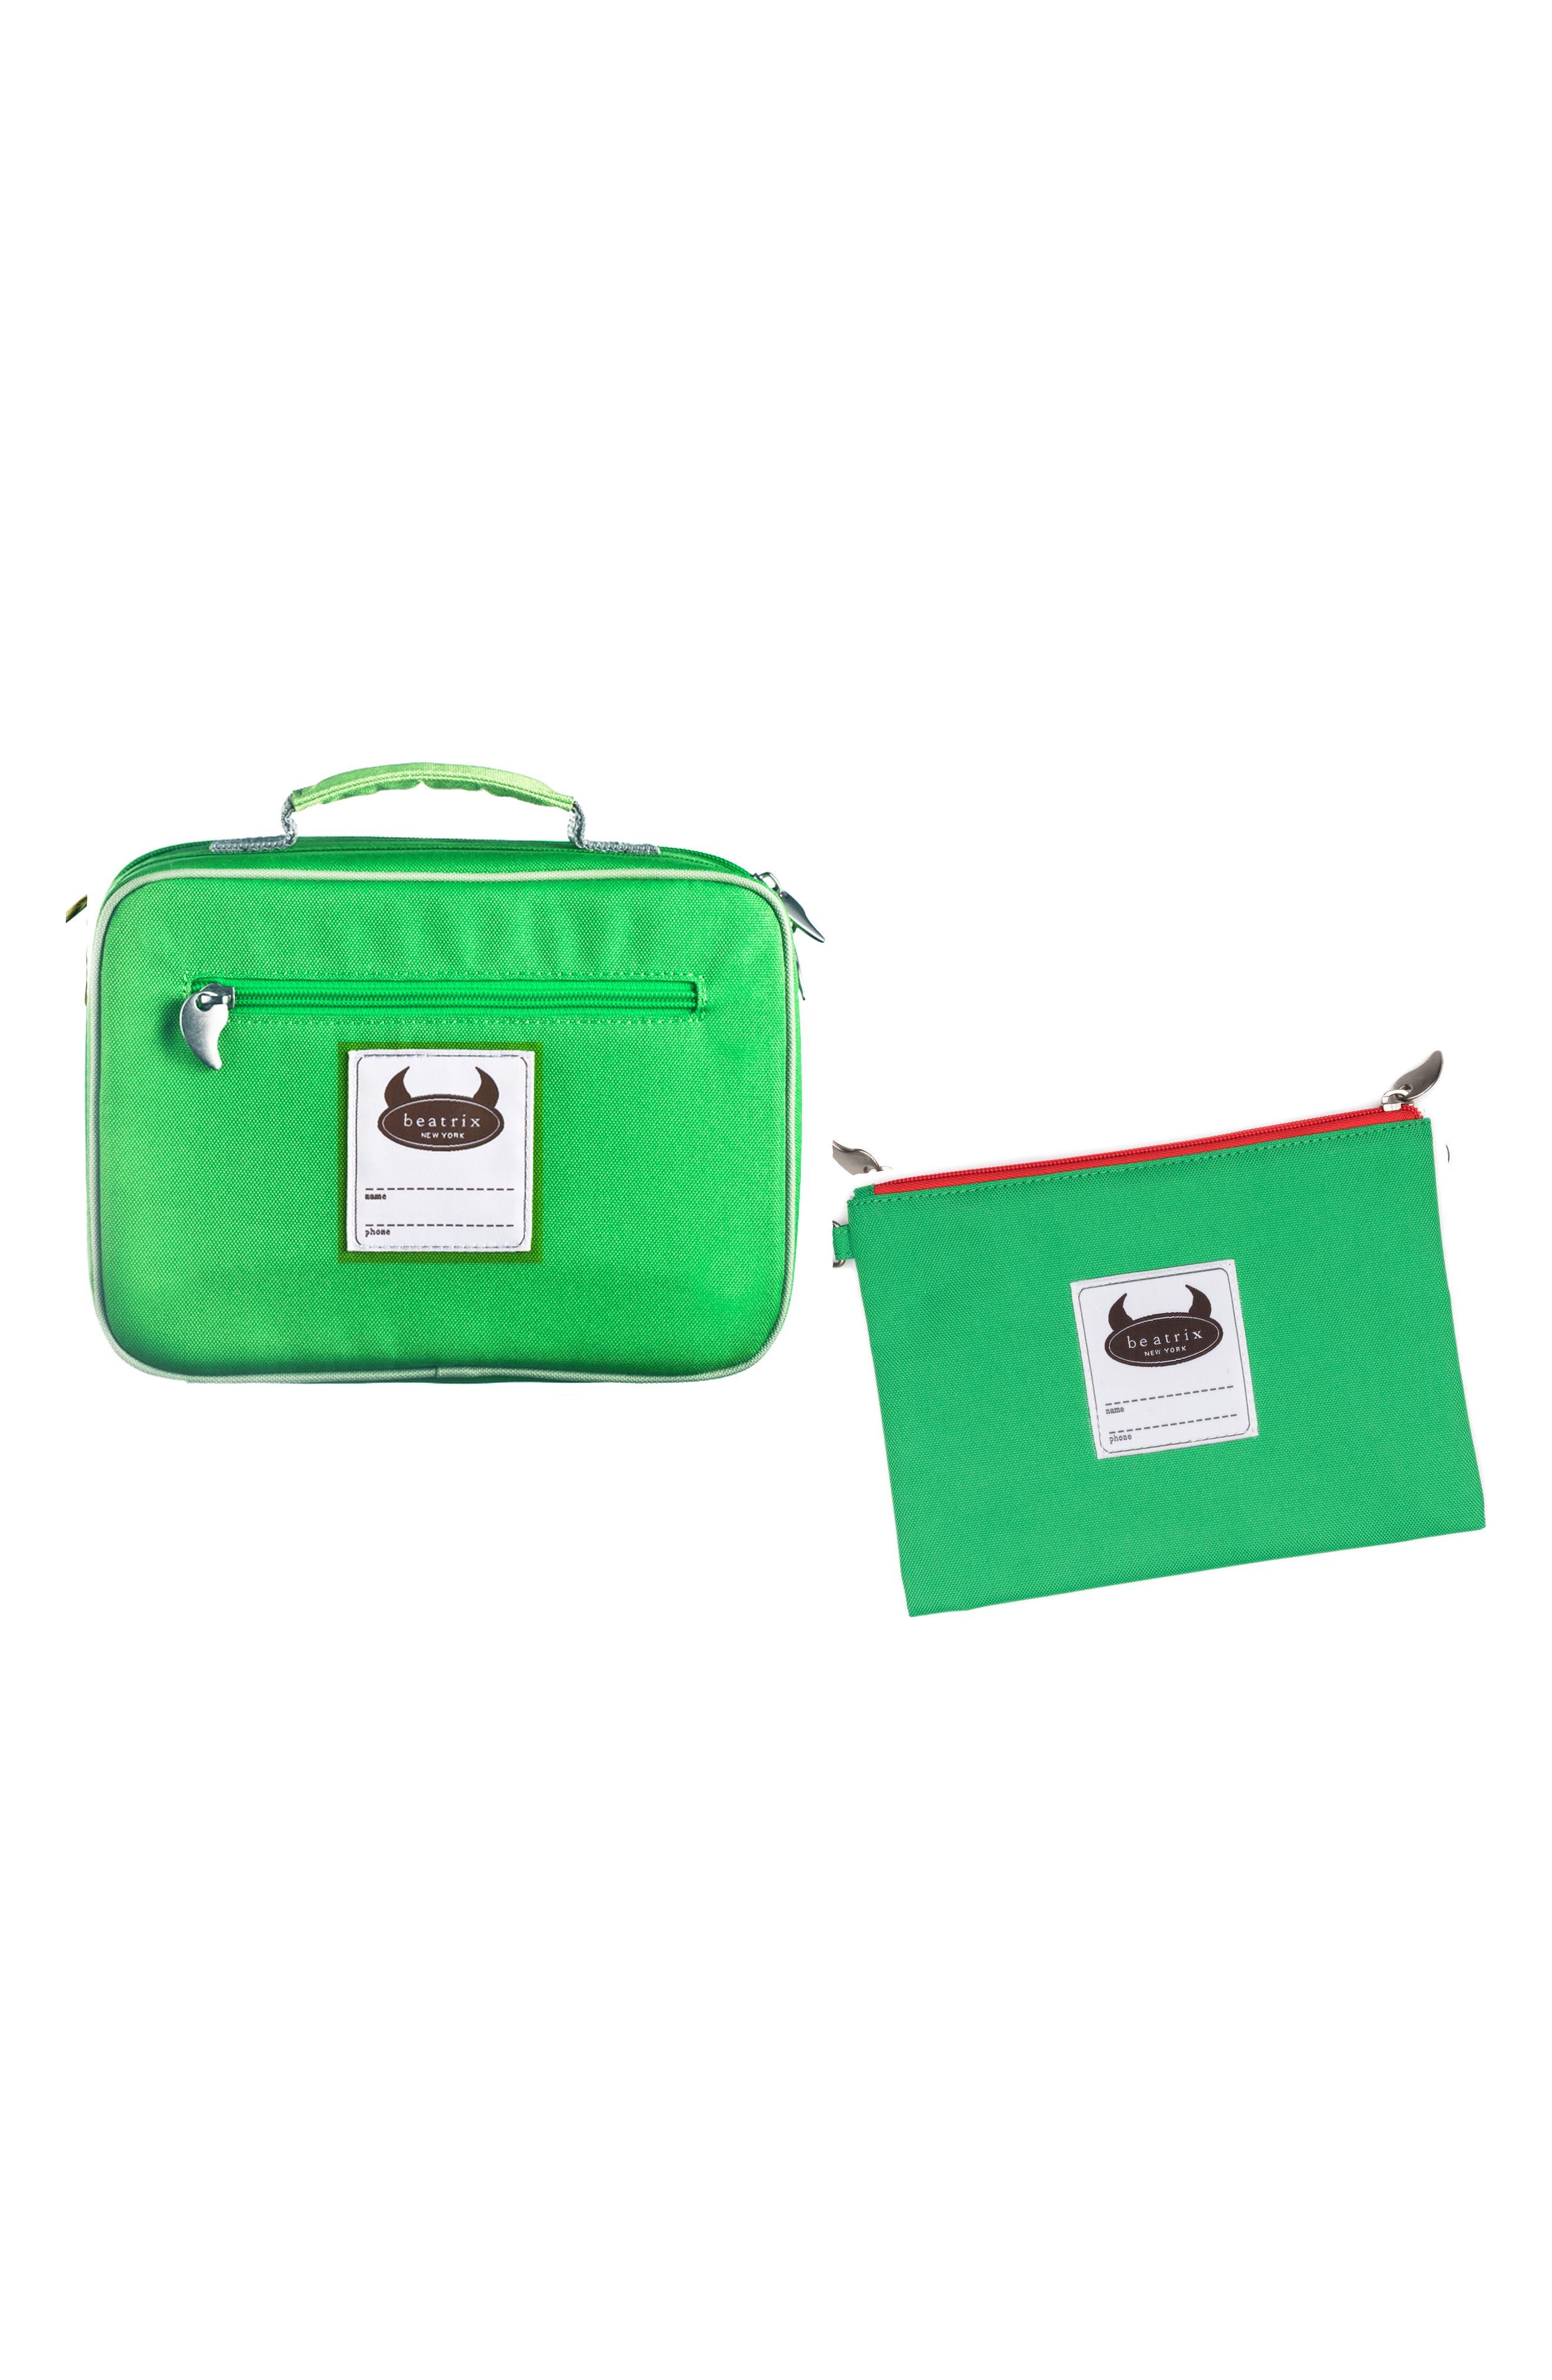 Lunch Box & Travel Pouch Set,                             Alternate thumbnail 7, color,